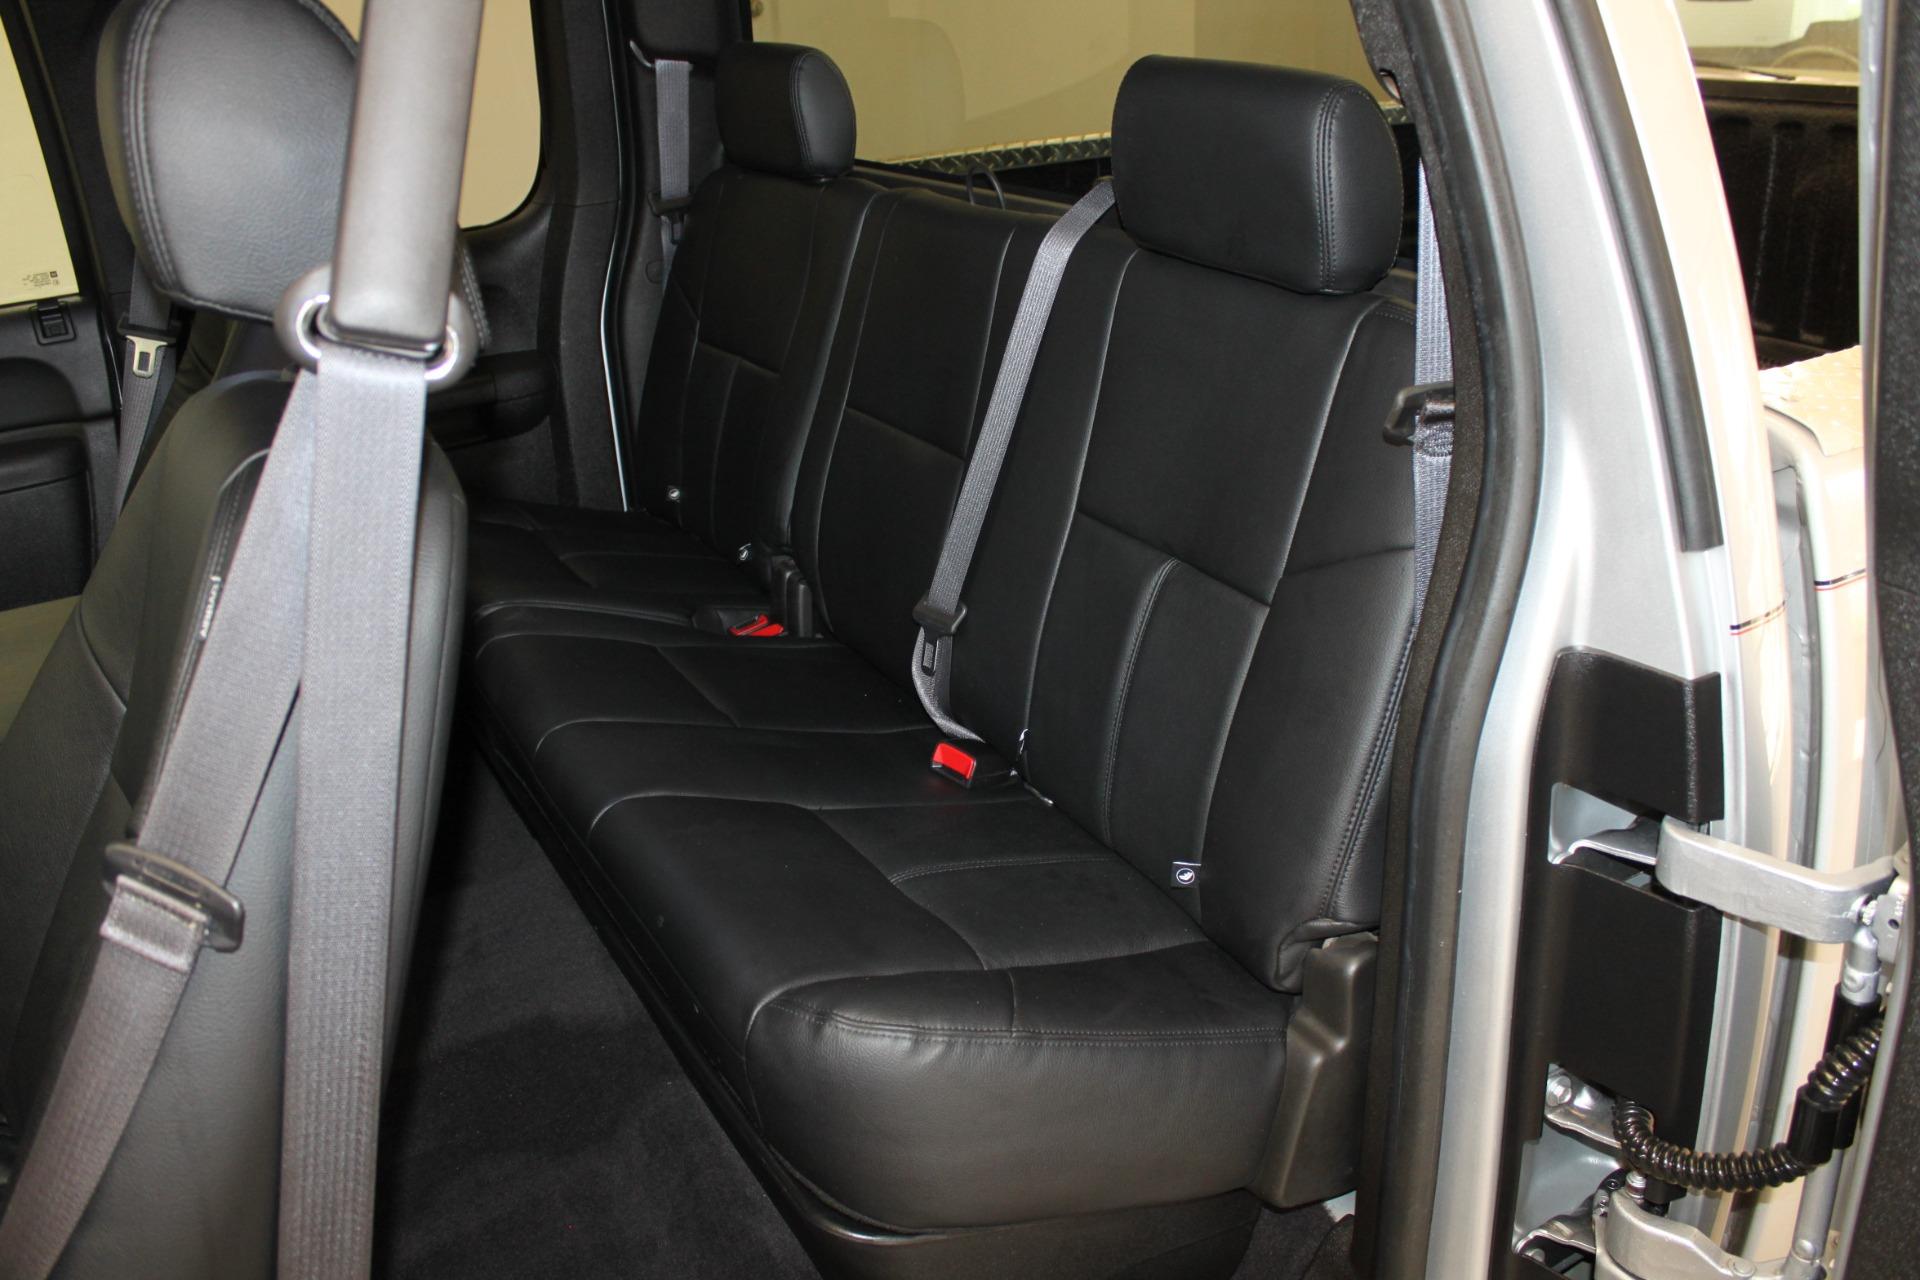 Used-2013-GMC-Sierra-1500-SLE-Z71-4X4-Chalenger